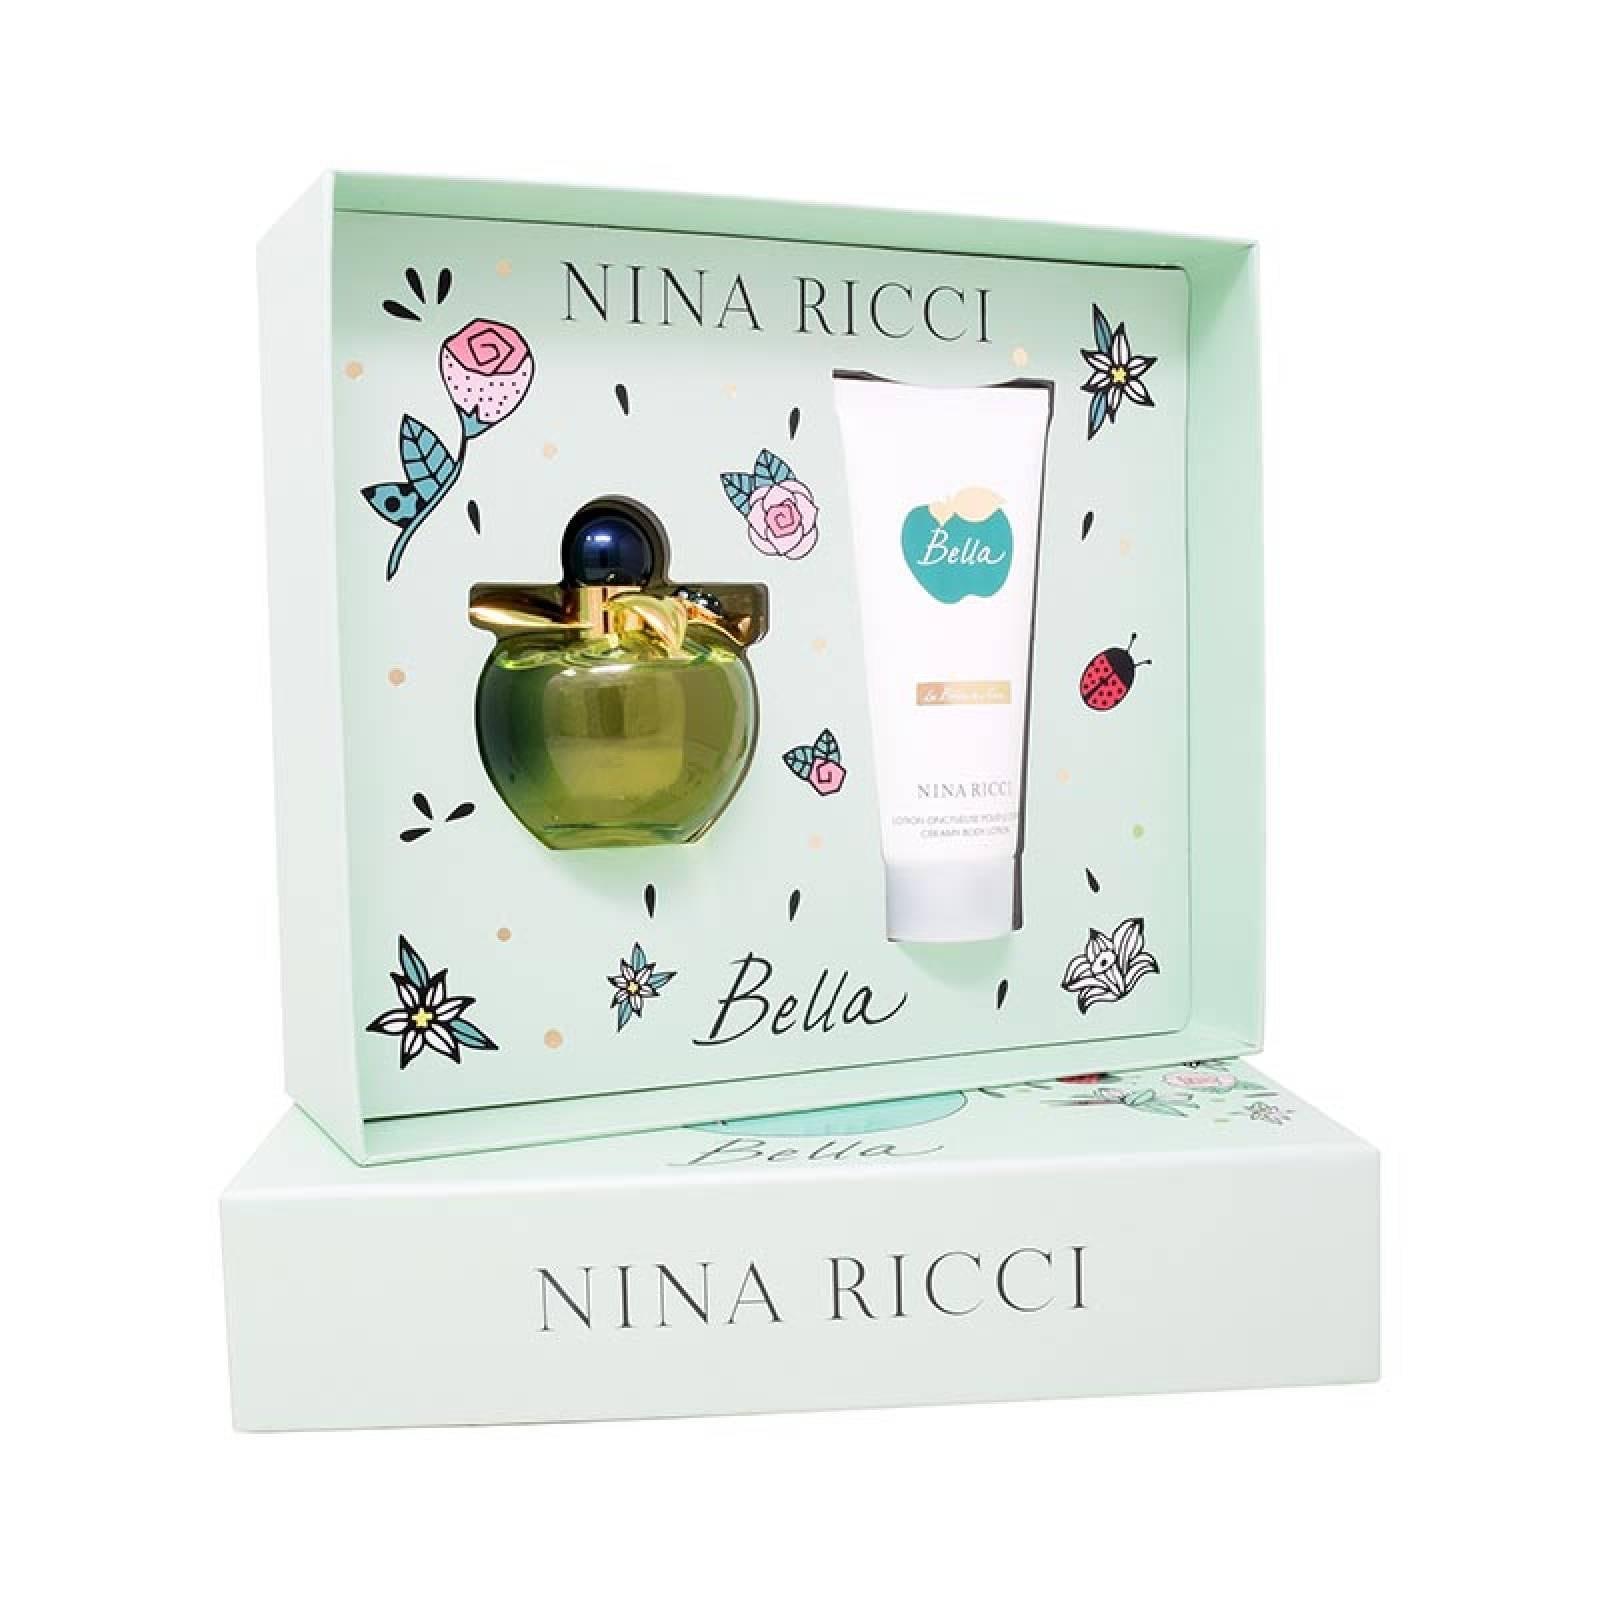 Set Nina Ricci Bella 2Pzs 80 ml Edt Spray + Body Lotion 100 ml de Nina Ricci